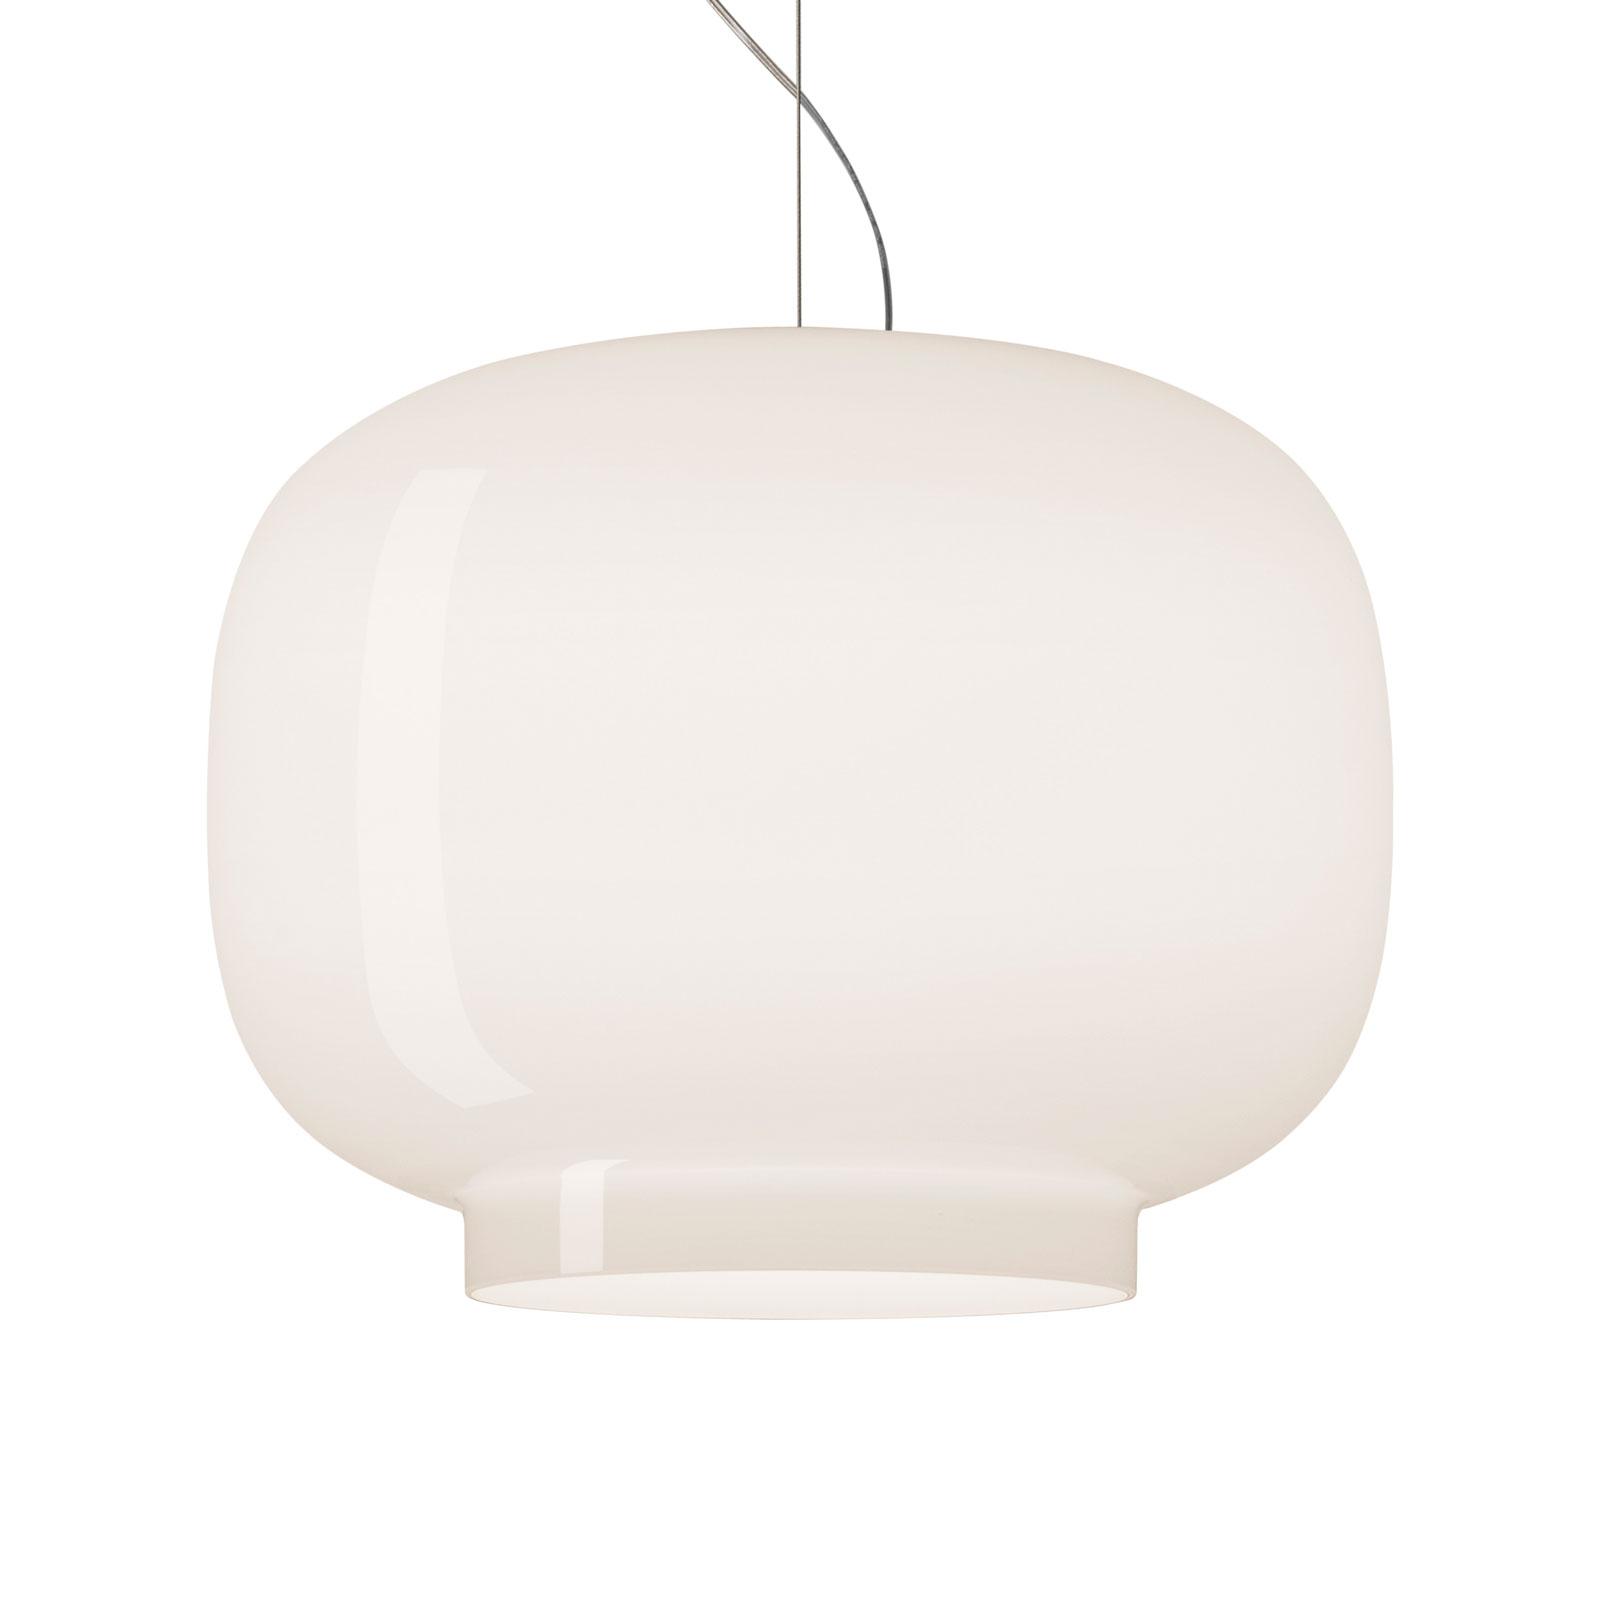 Foscarini Chouchin Bianco 1 MyLight LED-Hängelampe